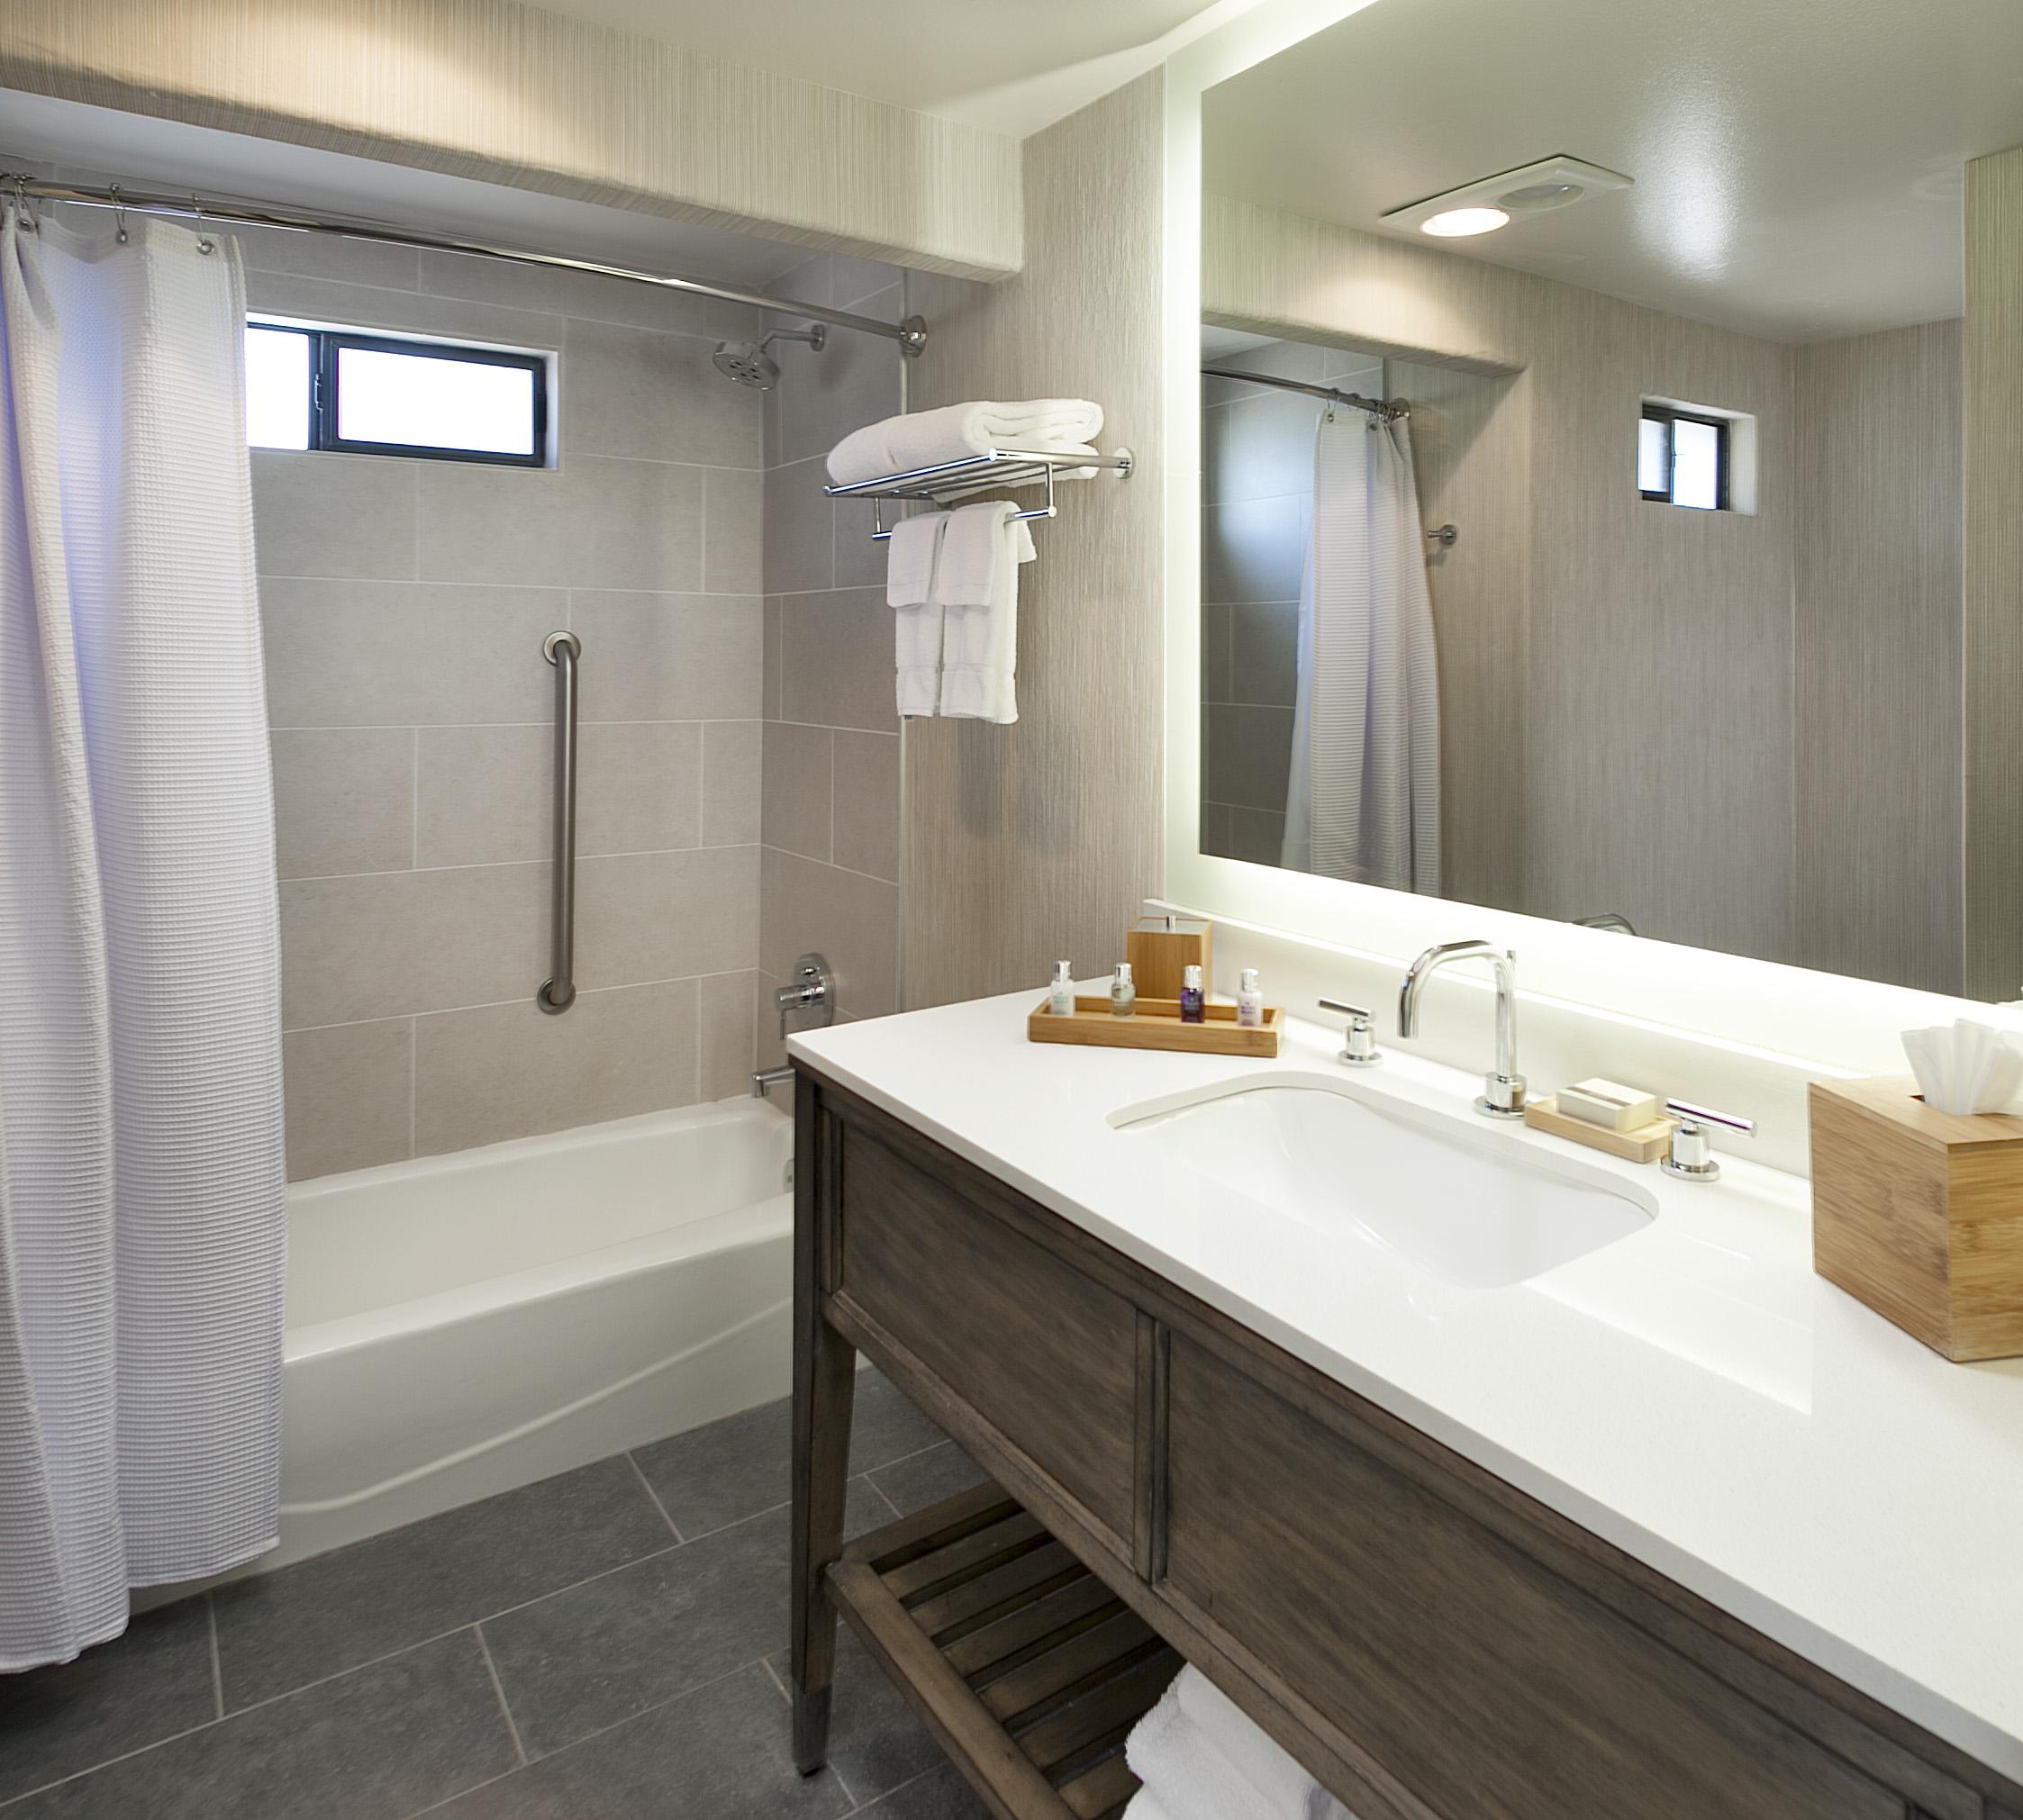 Hotel-Bathroom 1.jpg